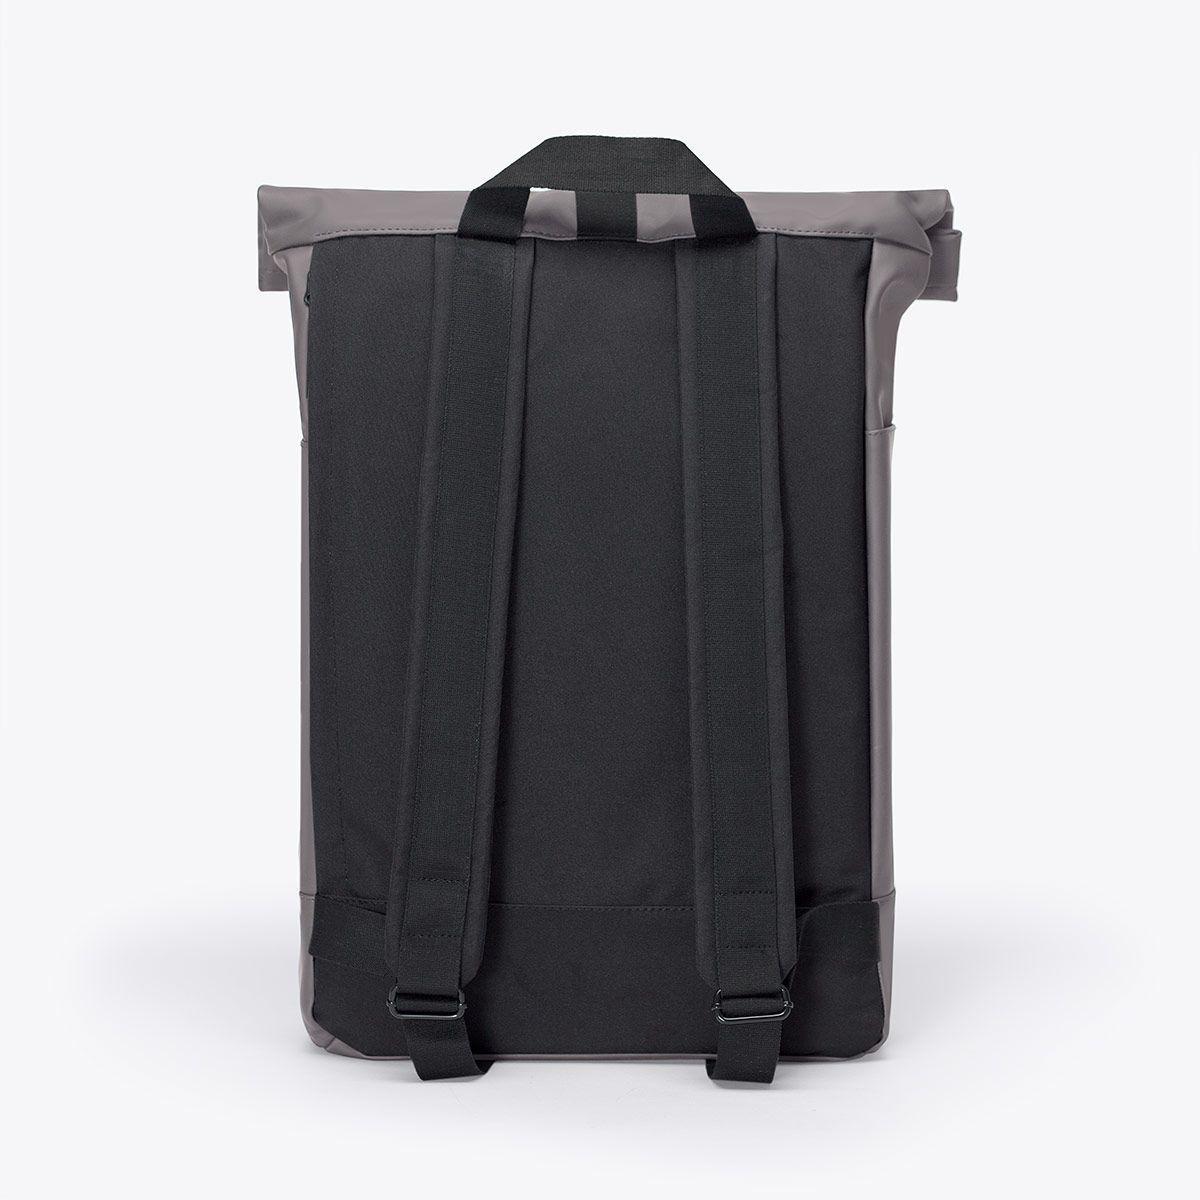 Ucon Acrobatics Ucon Acrobatics Hajo Backpack - Lotus Series - Dark Grey